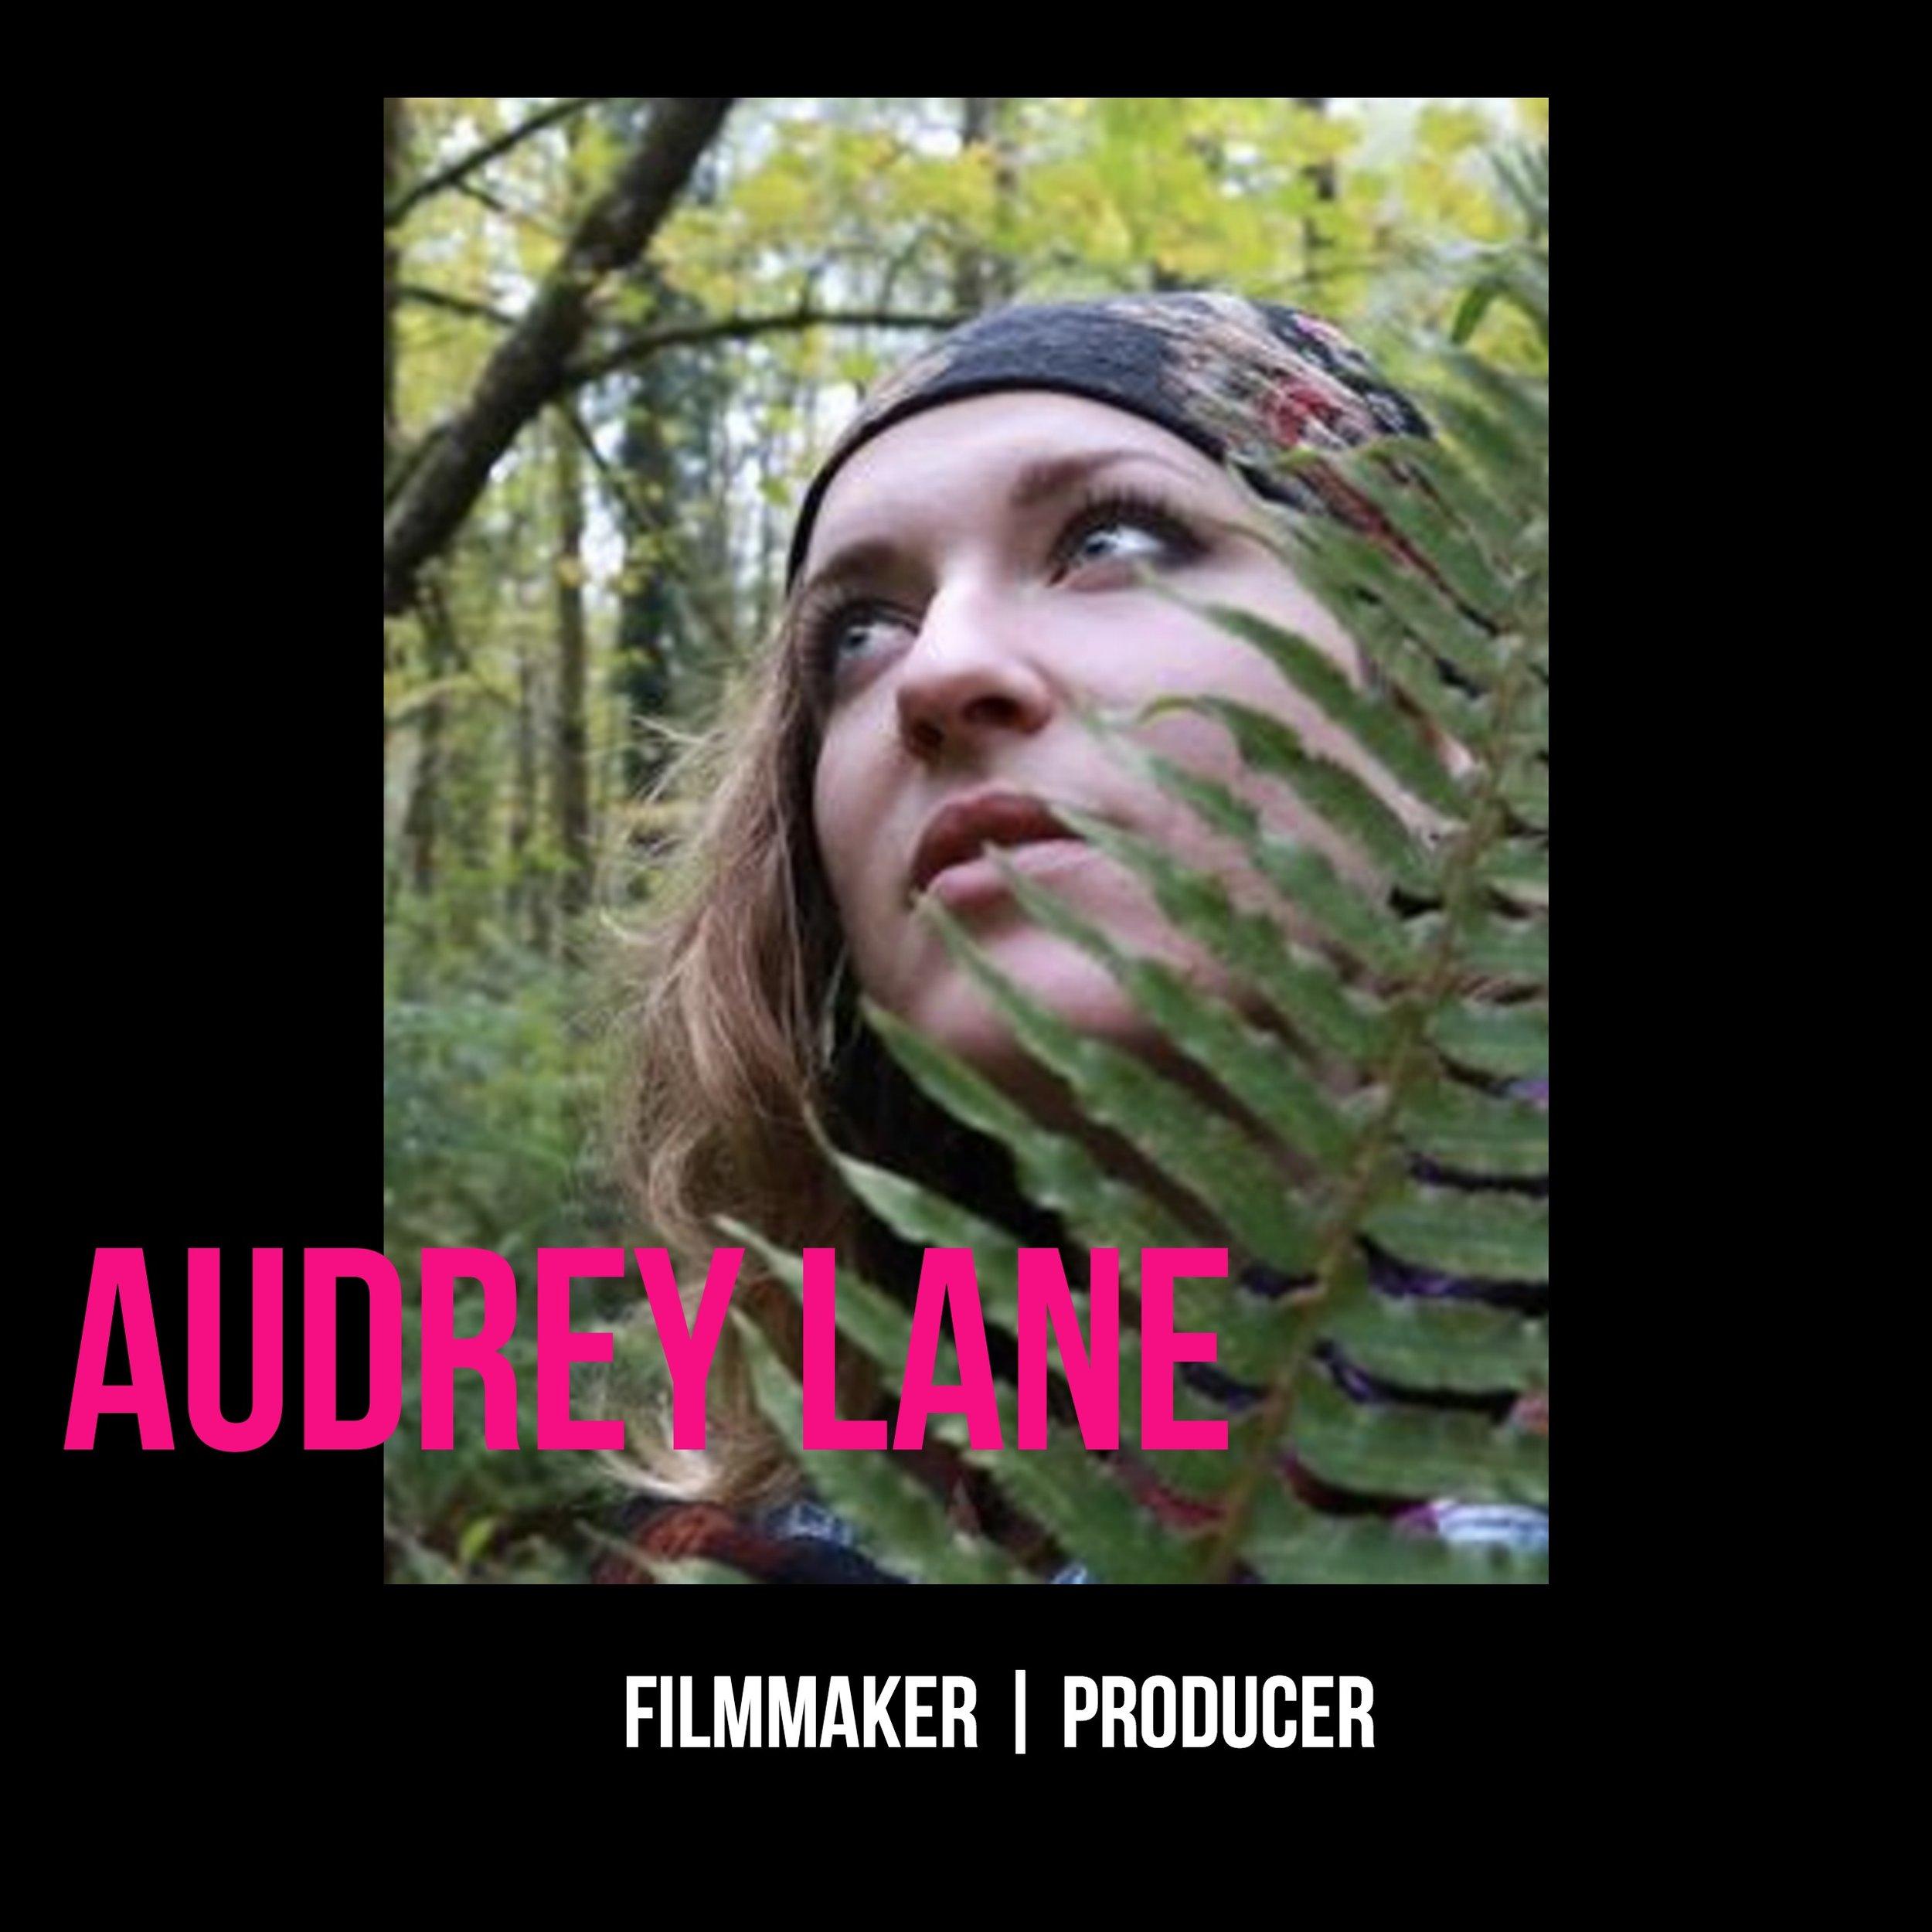 THE JILLS OF ALL TRADES™ Audrey Lane Filmmaker & Producer